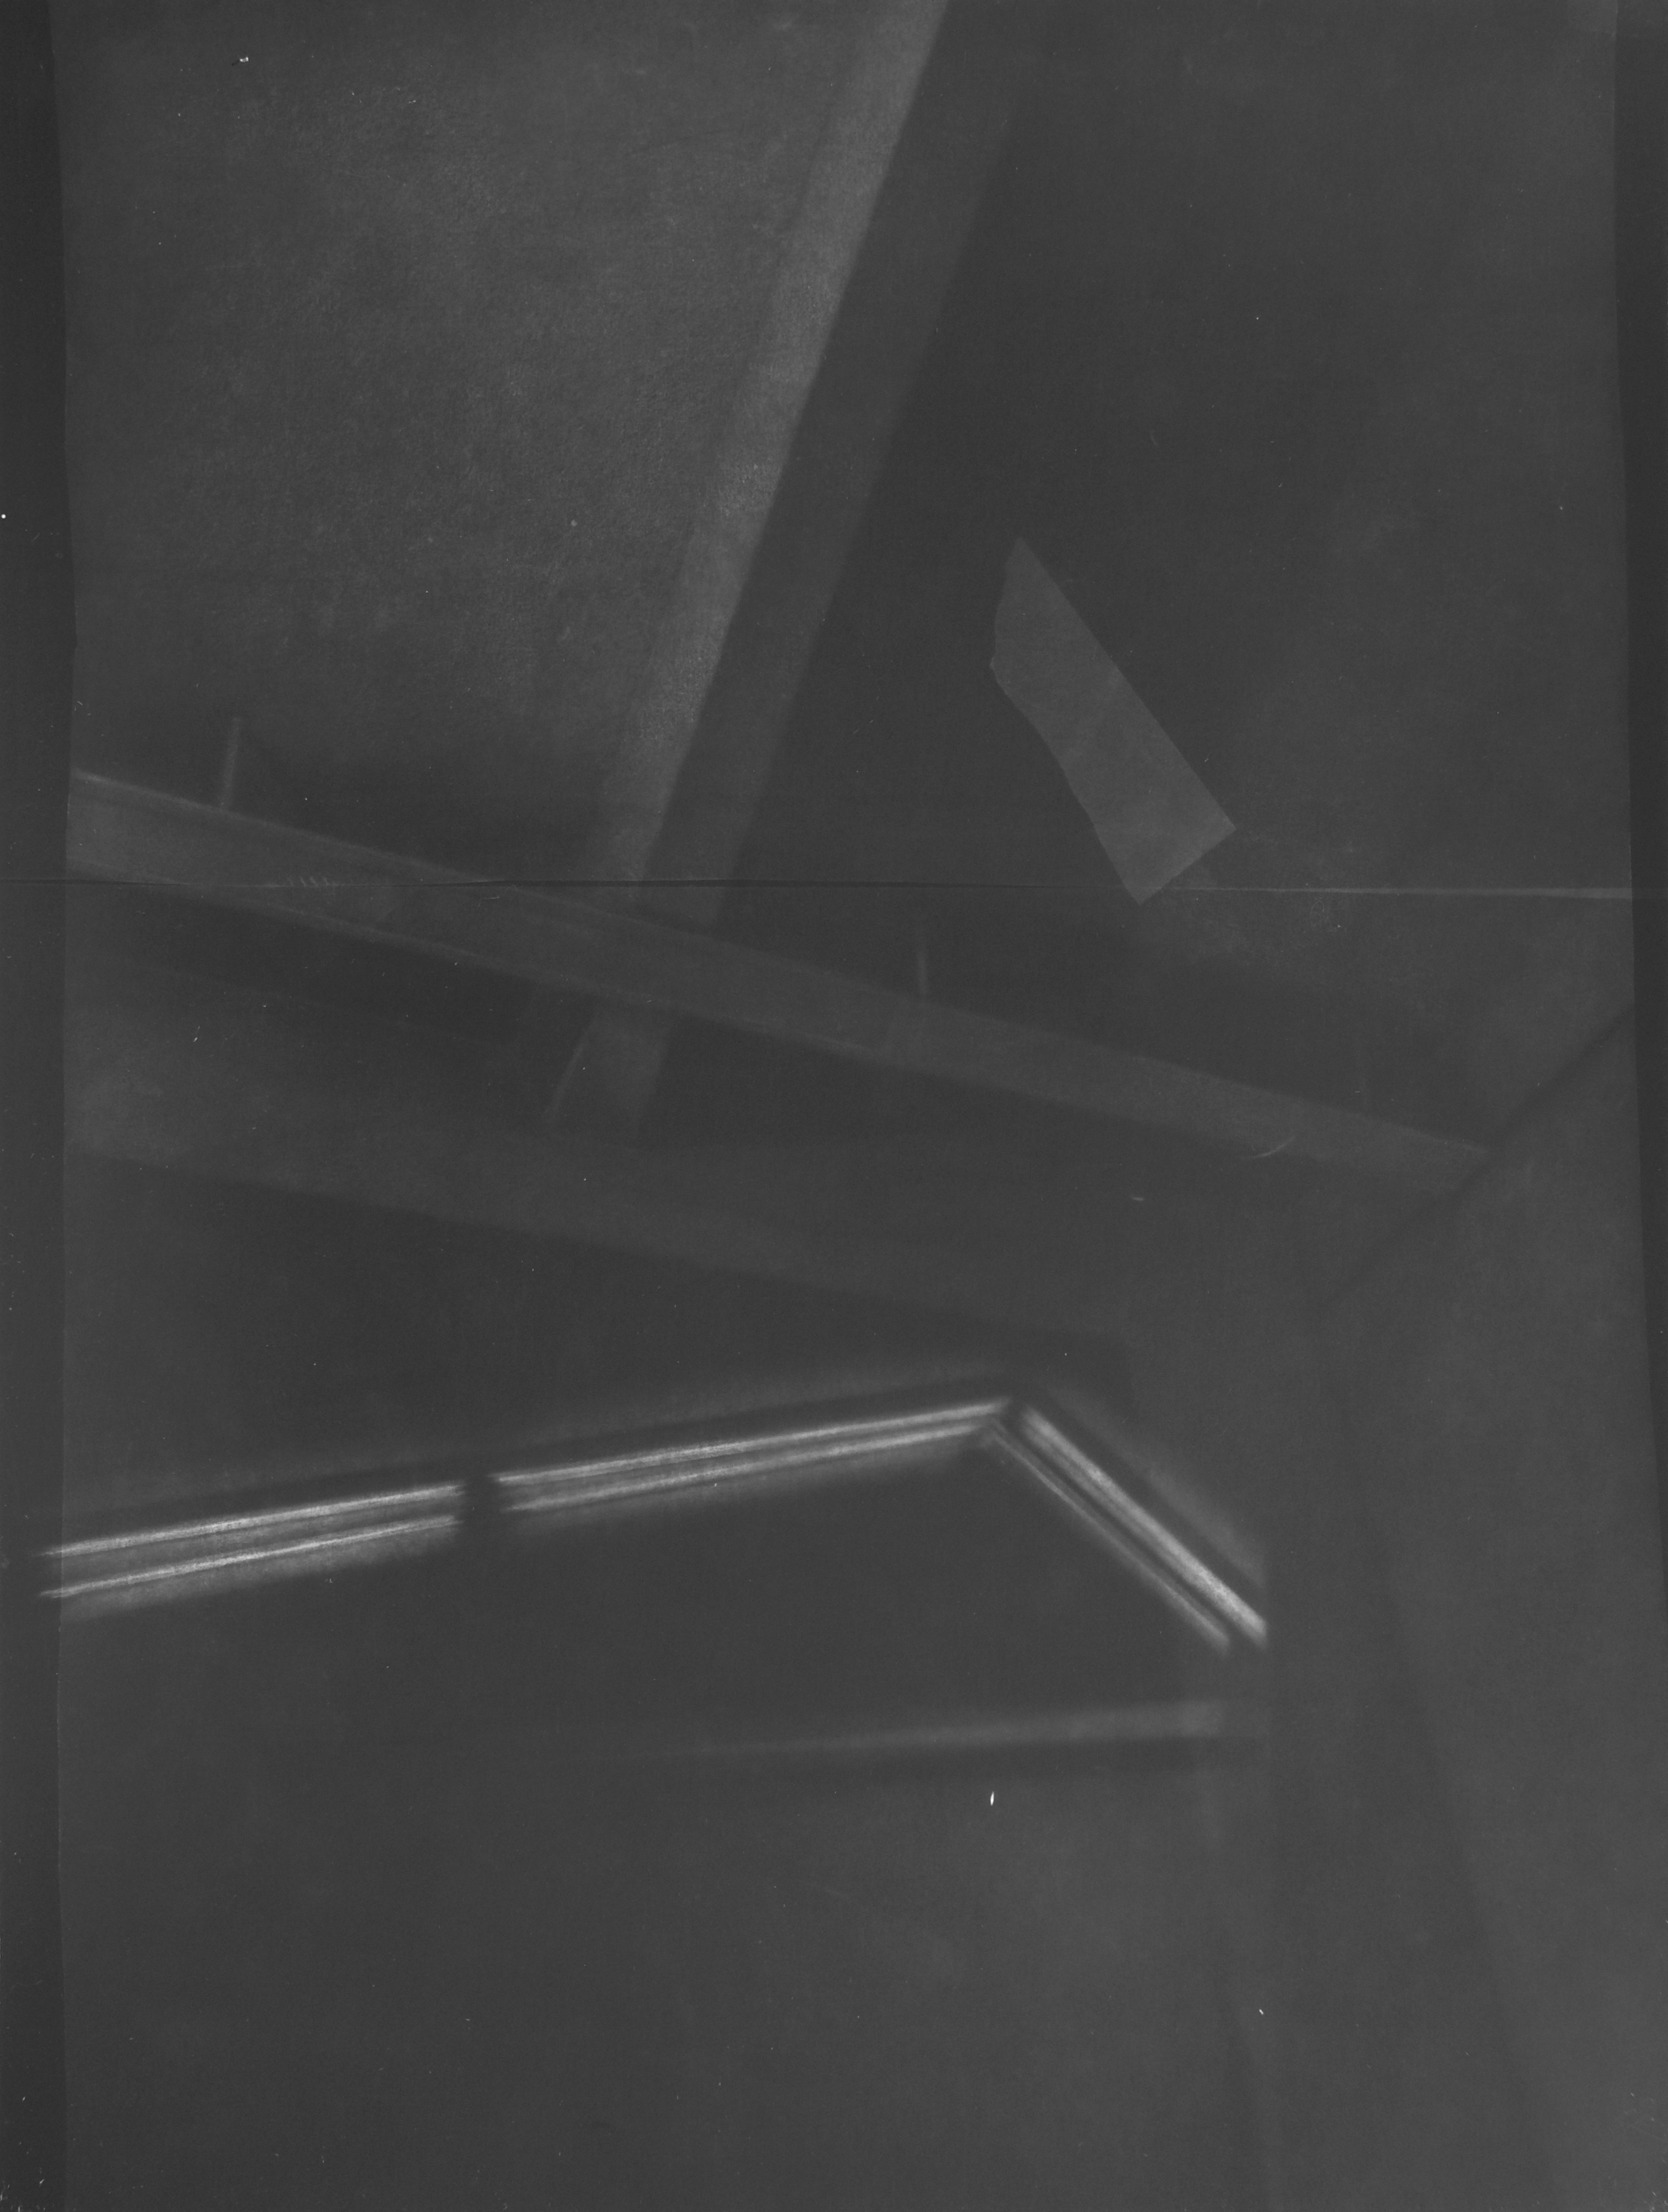 Galerie Barbara Thumm \ New Viewings #5 \ Farhad Farzaliyev